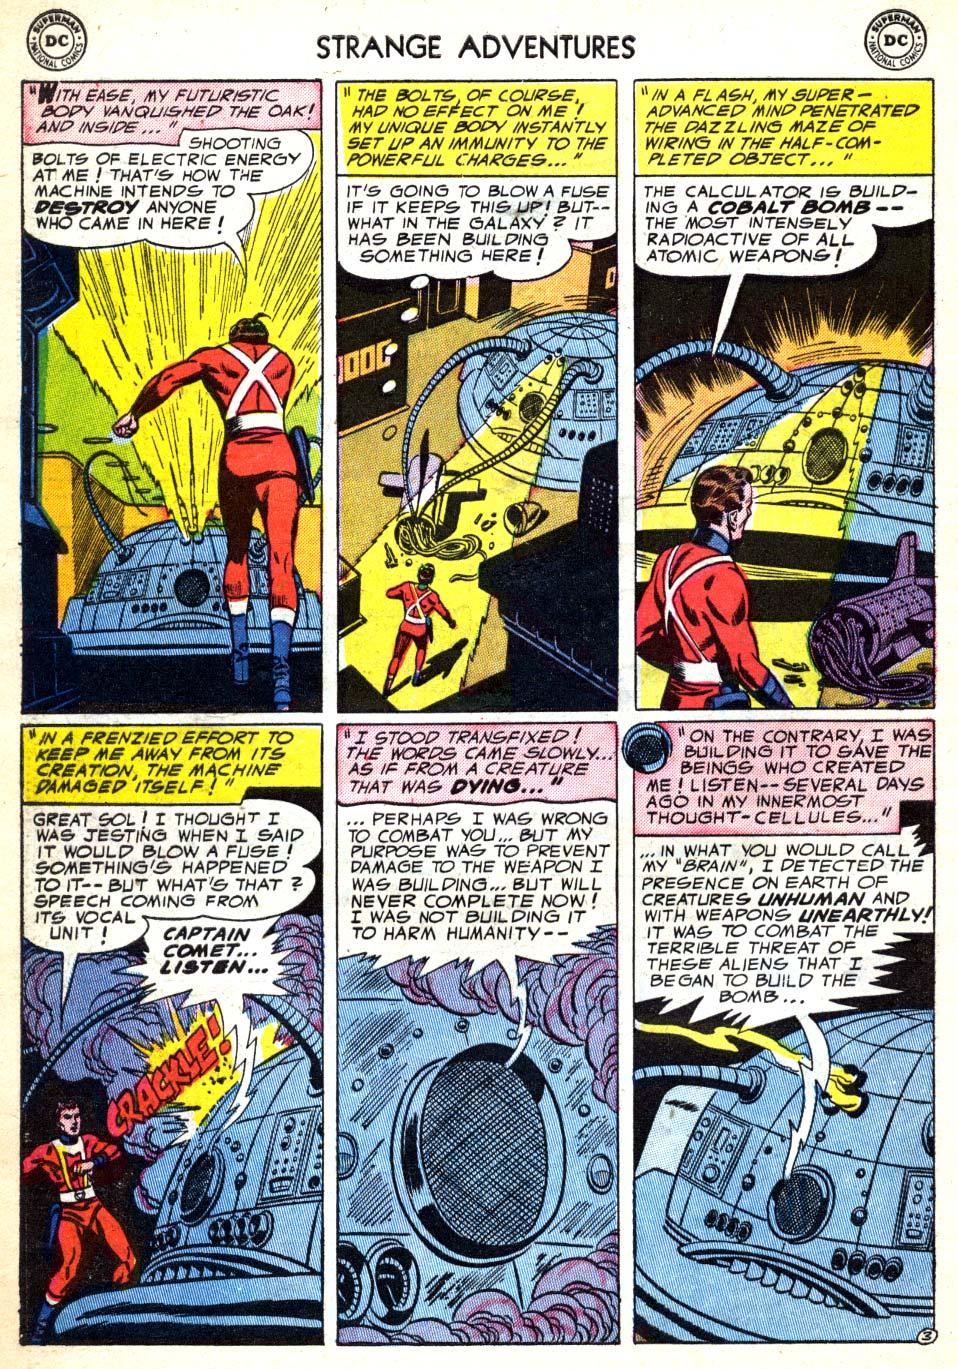 Strange Adventures (1950) issue 49 - Page 30